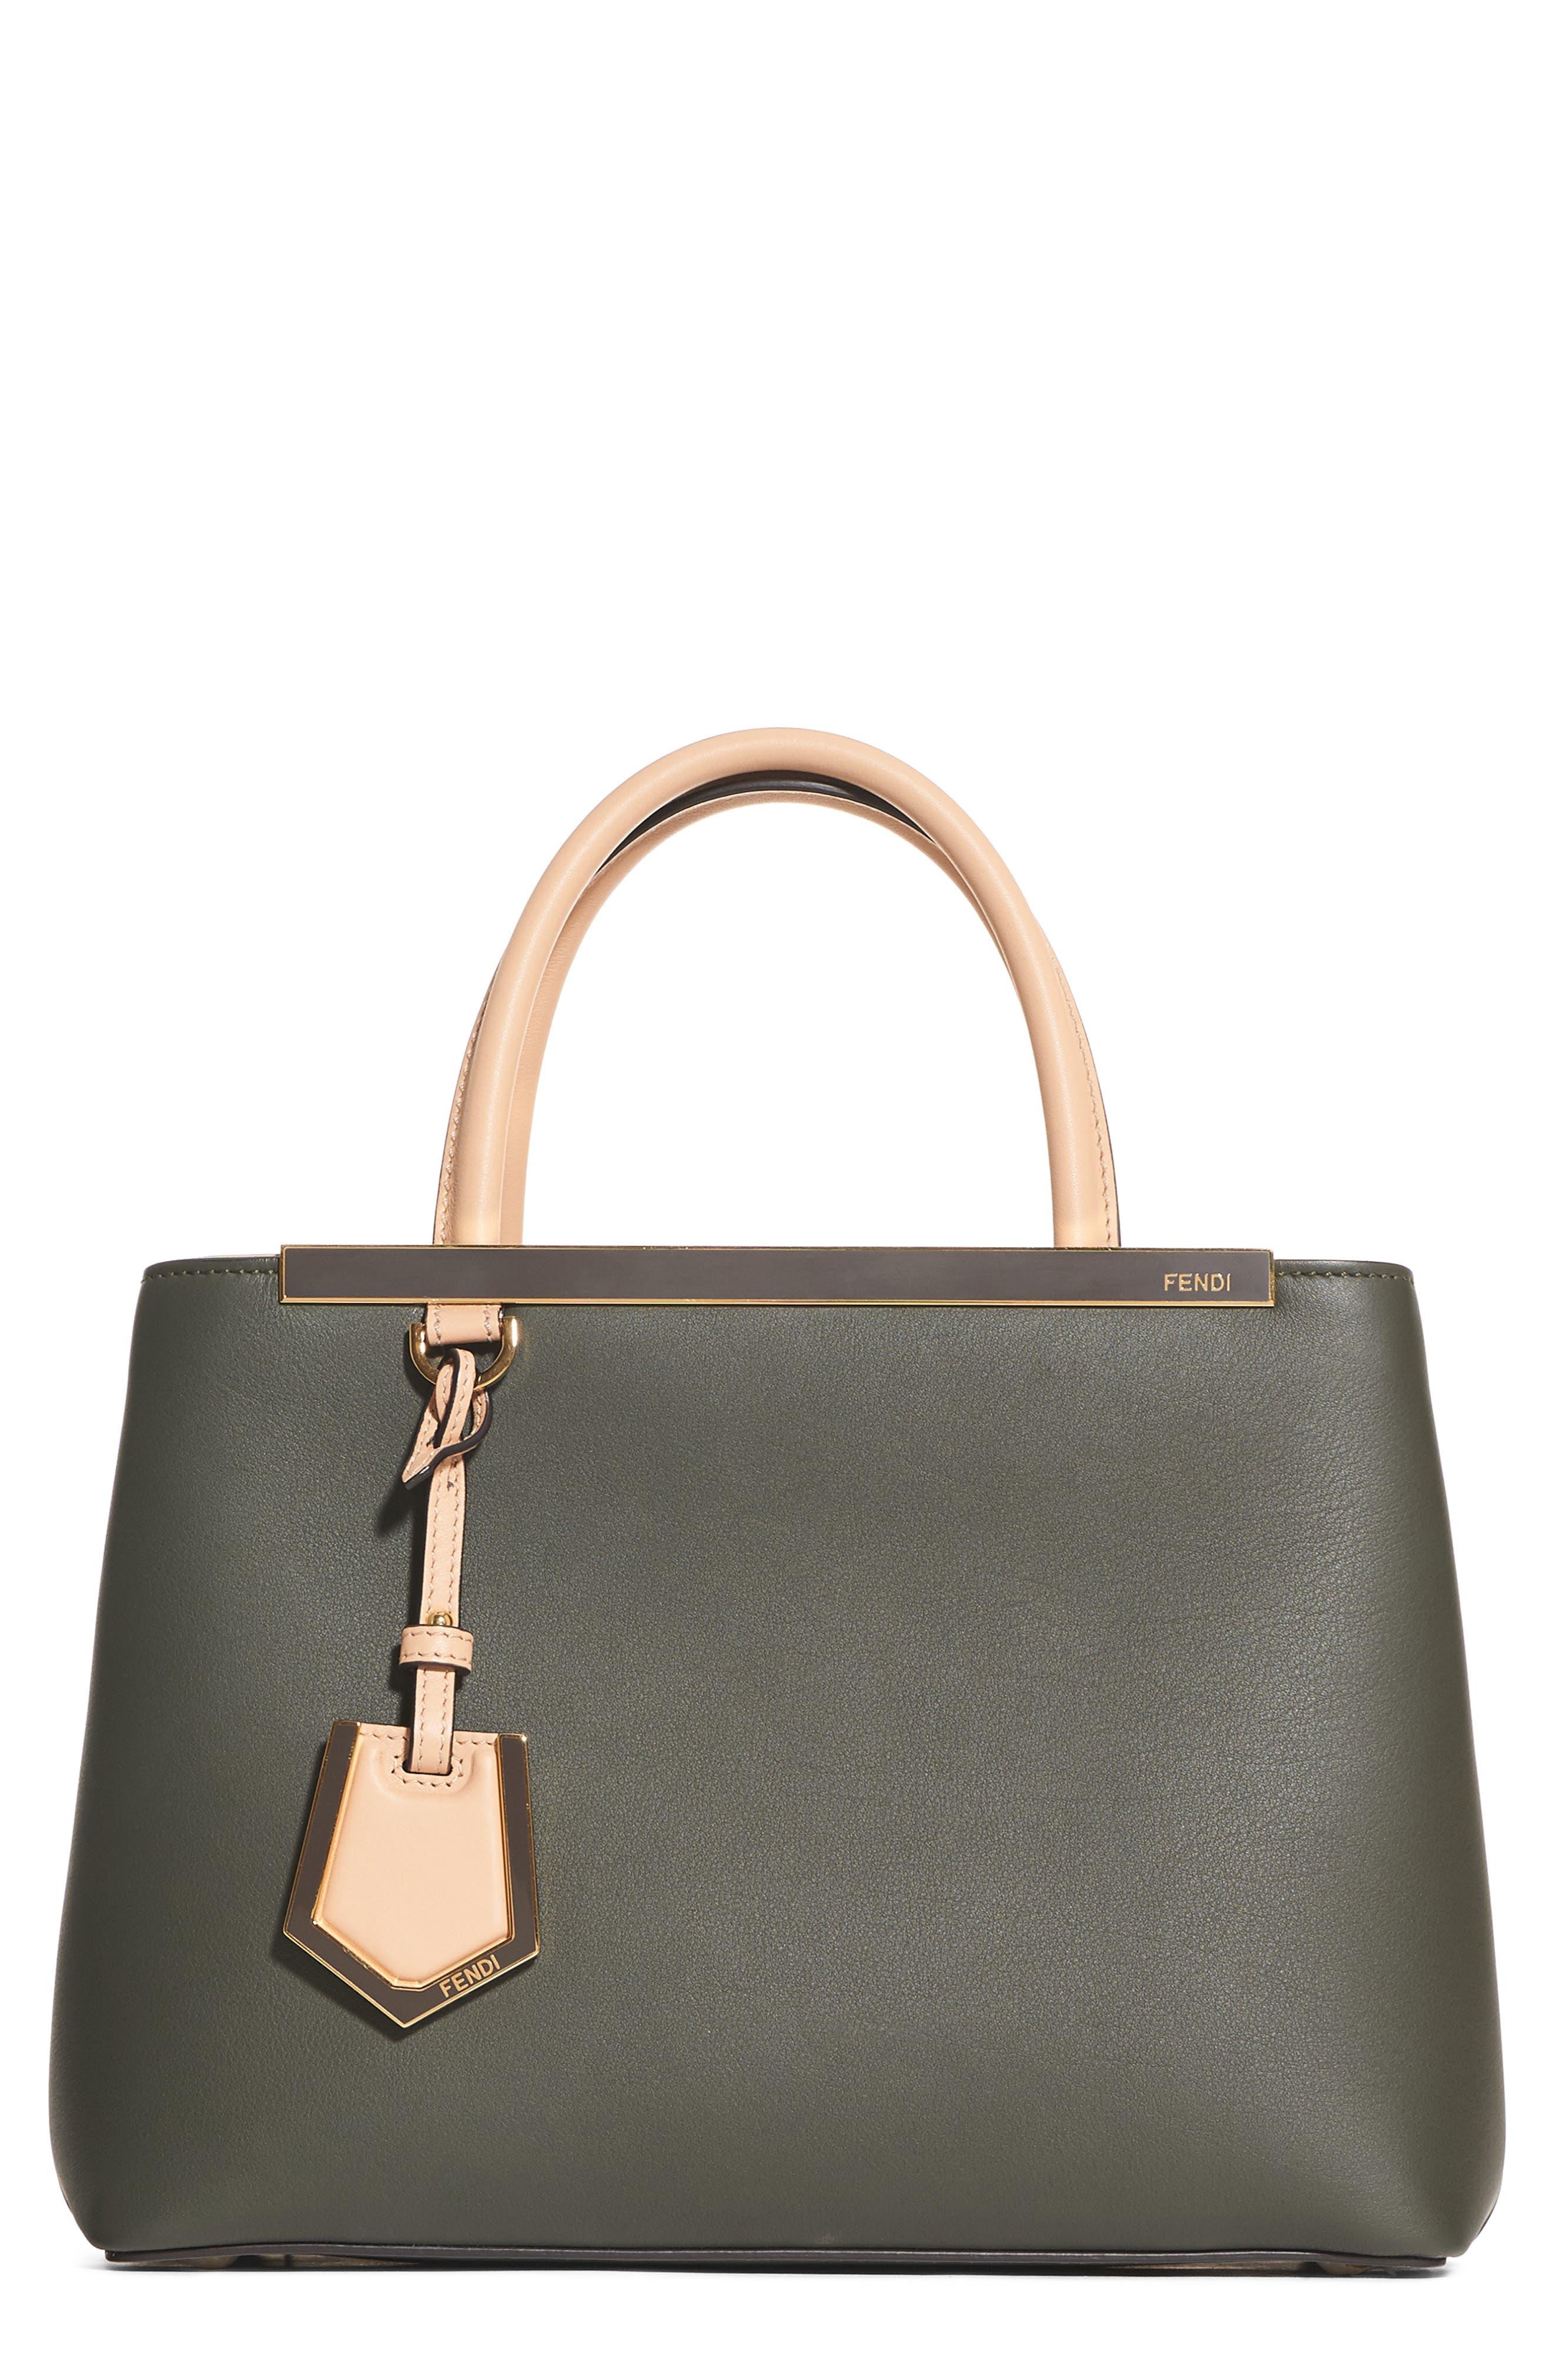 Petite 2Jours Leather Shopper,                         Main,                         color, GREEN GRASS/MAKEUP